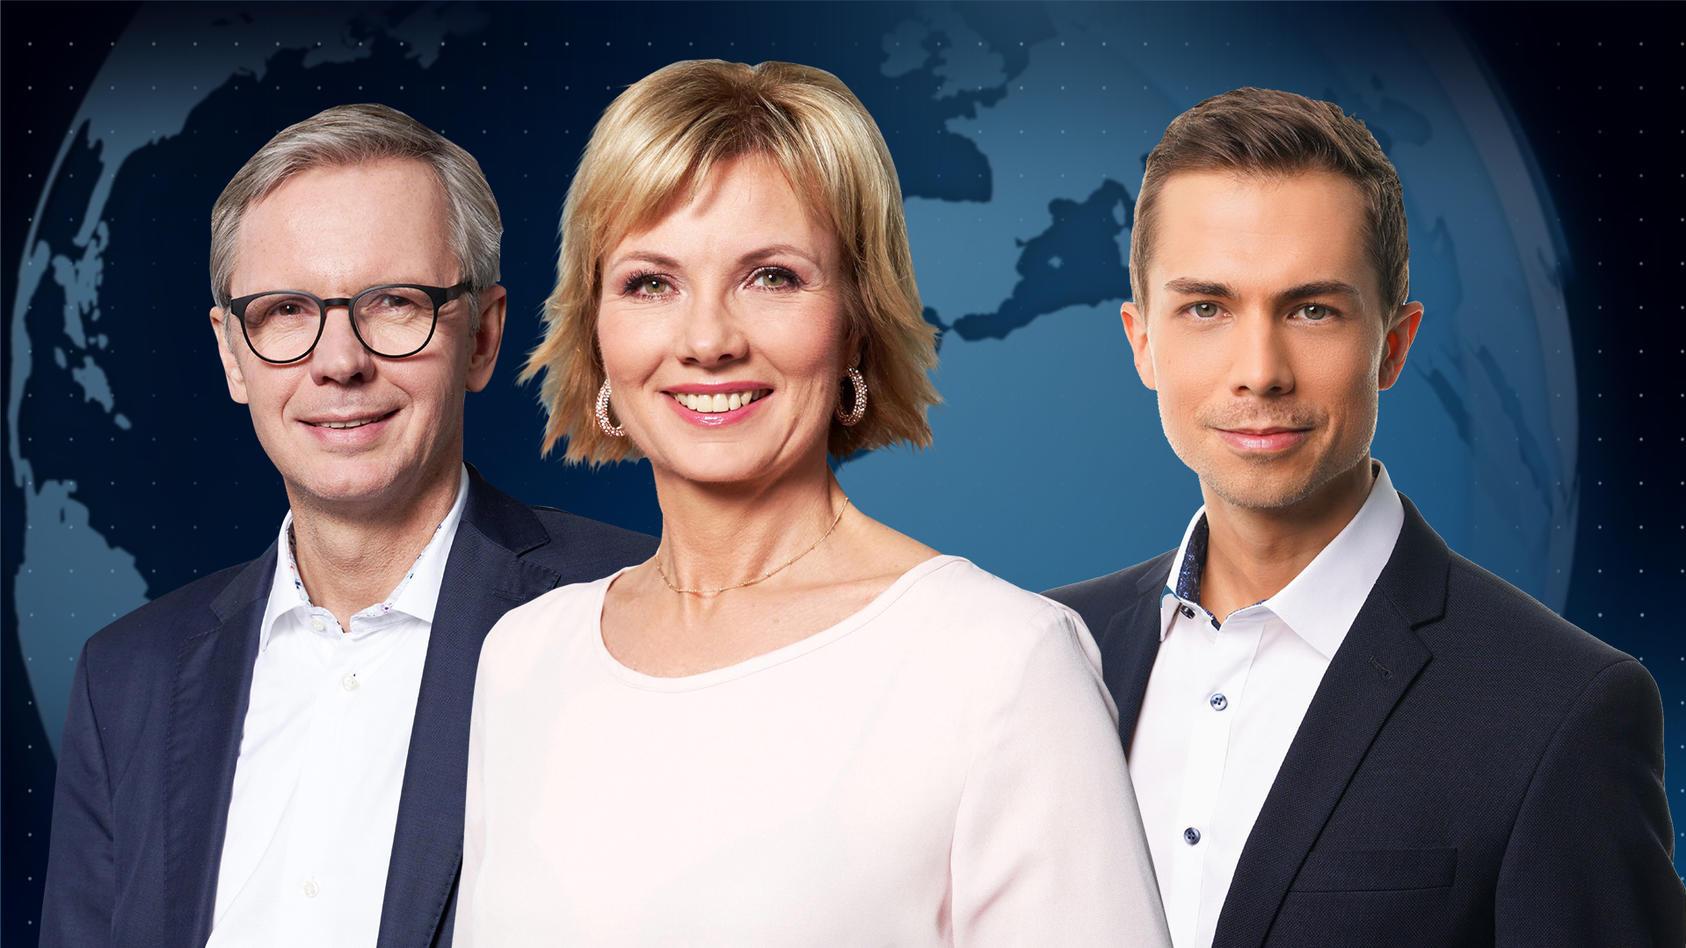 Lothar Keller, Ilka Eßmüller und Christoph Hoffmann moderieren das 'RTL Nachtjournal'.